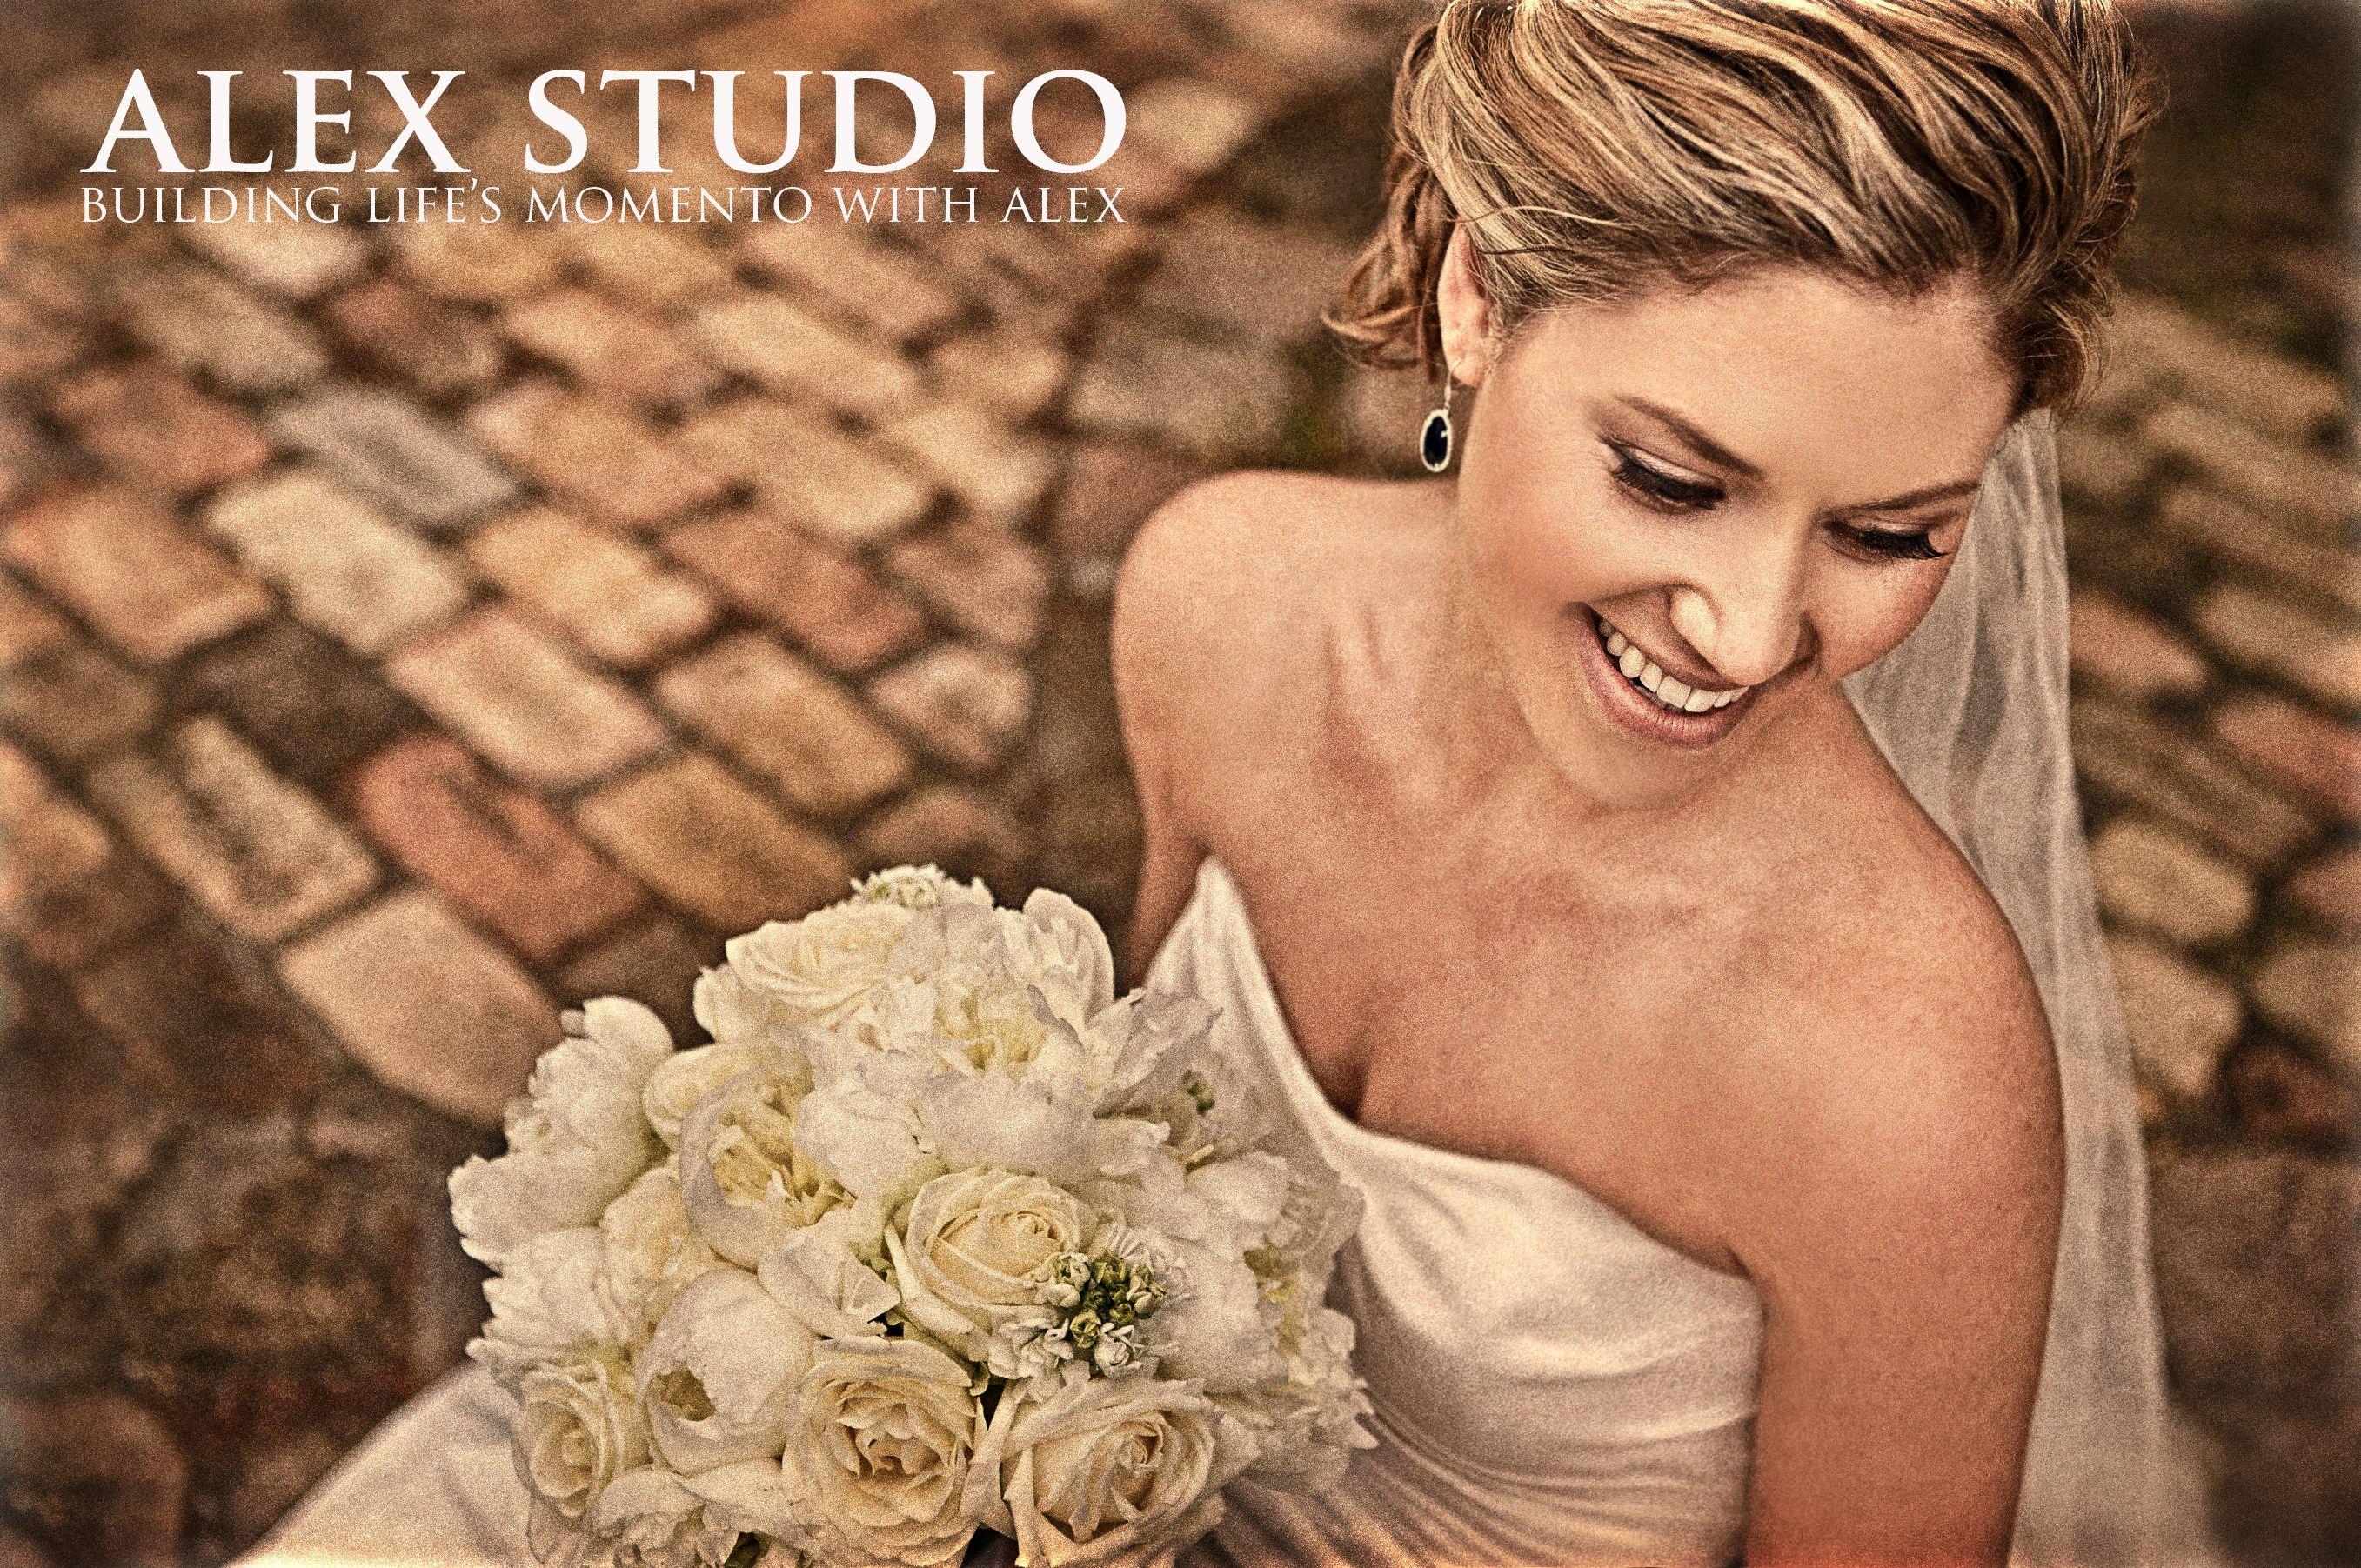 ALEX STUDIO PHOTOGRAPHY AND CINEMATOGRAPHY Maternity, Newborn, Head shot, Fashion portfolio Destination Wedding- Worldwide Travel Please contact us at 425.883.6800 Wedding, Bride Self Portrait with bontique